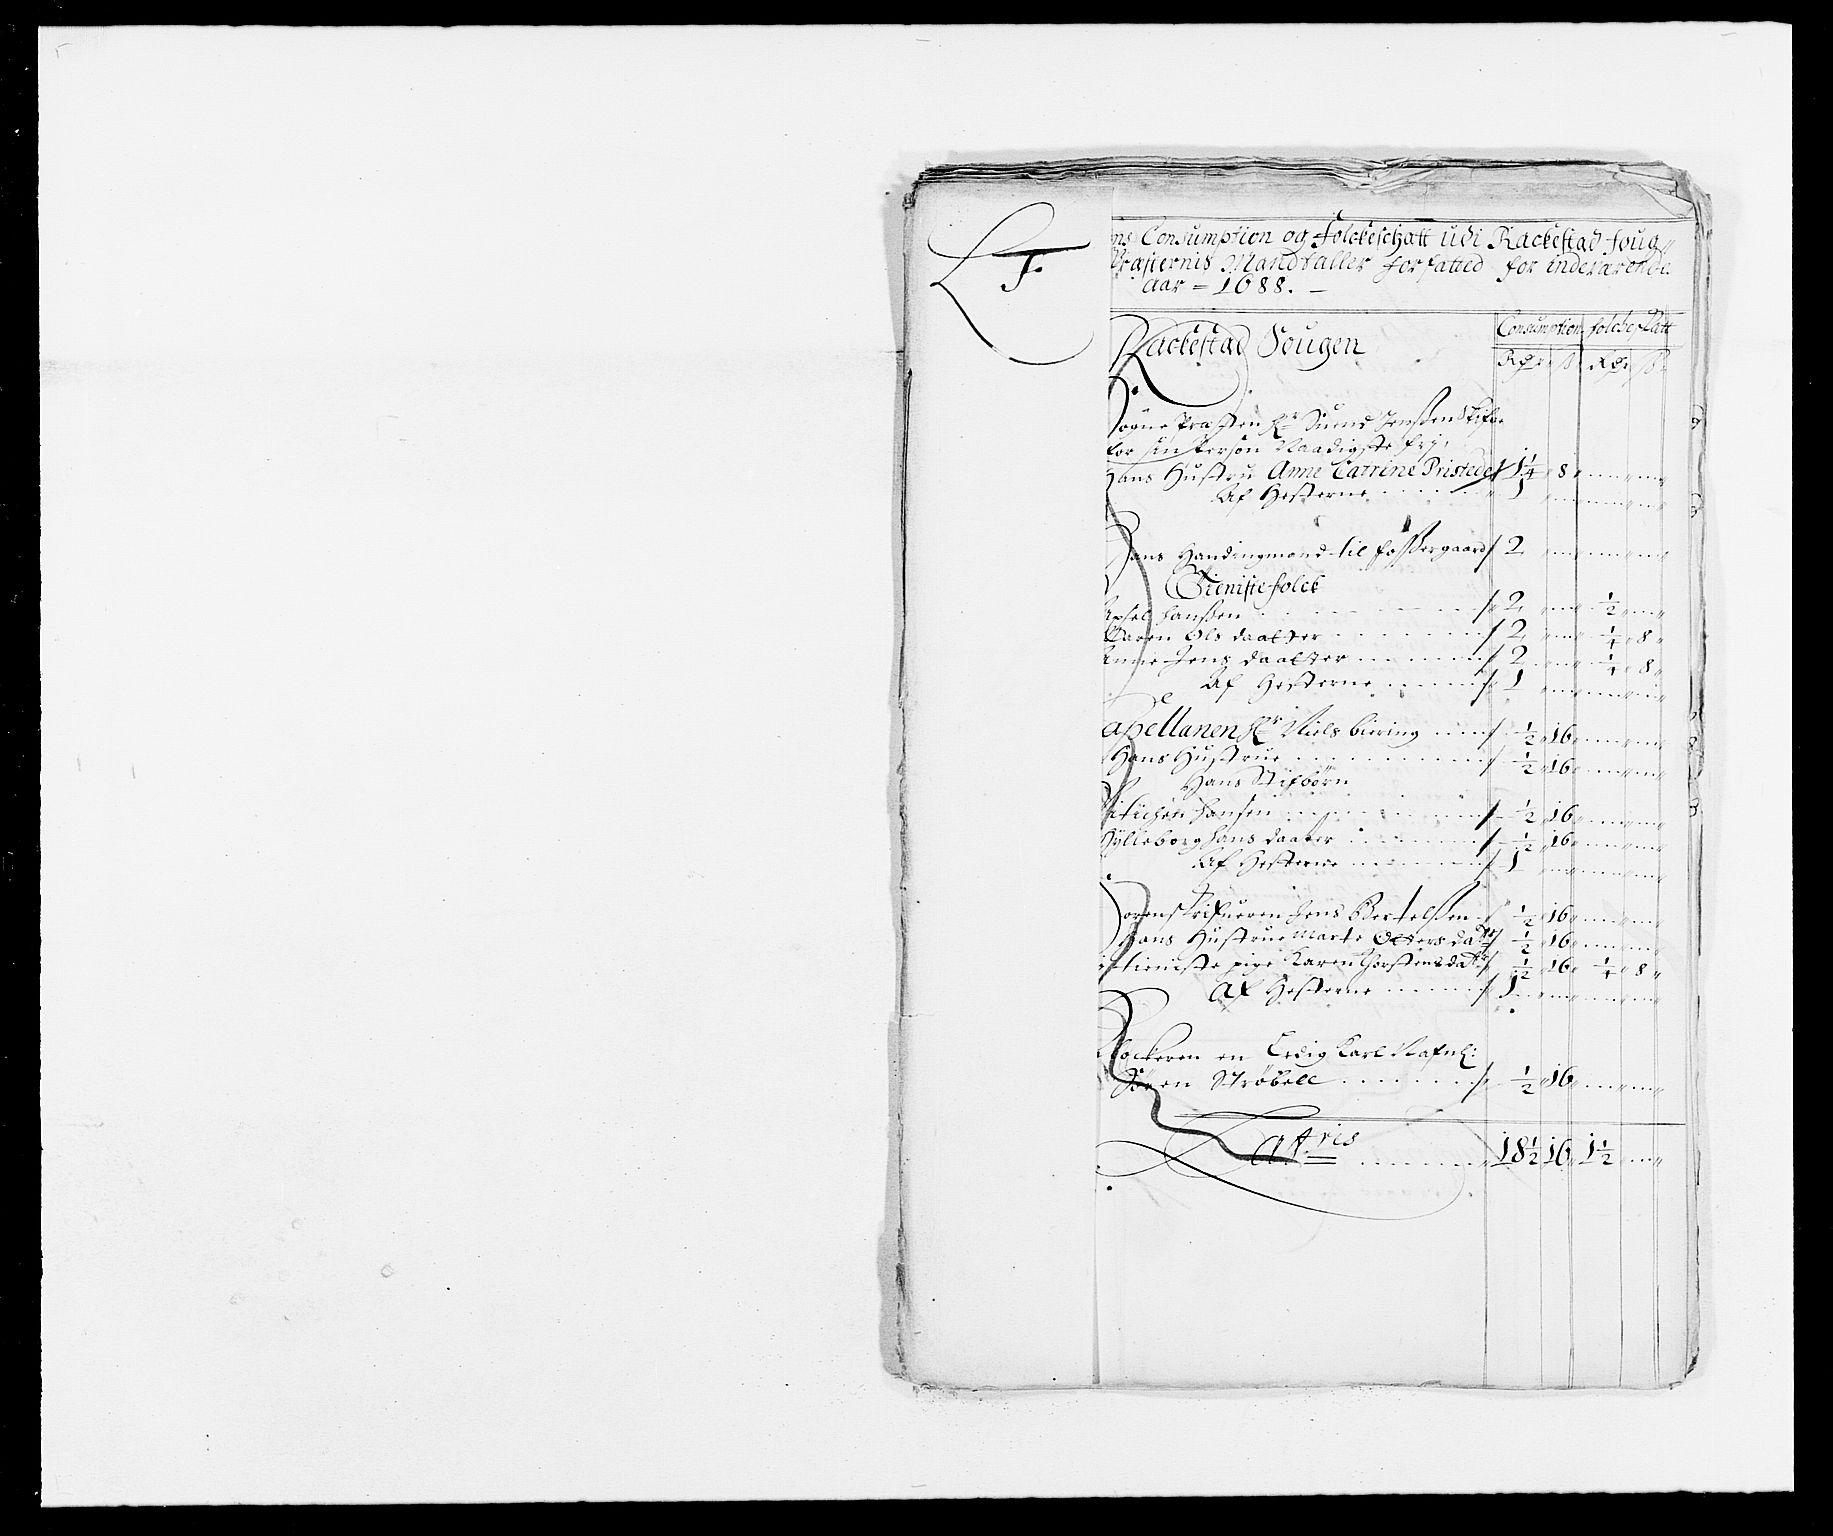 RA, Rentekammeret inntil 1814, Reviderte regnskaper, Fogderegnskap, R05/L0276: Fogderegnskap Rakkestad, 1683-1688, s. 224